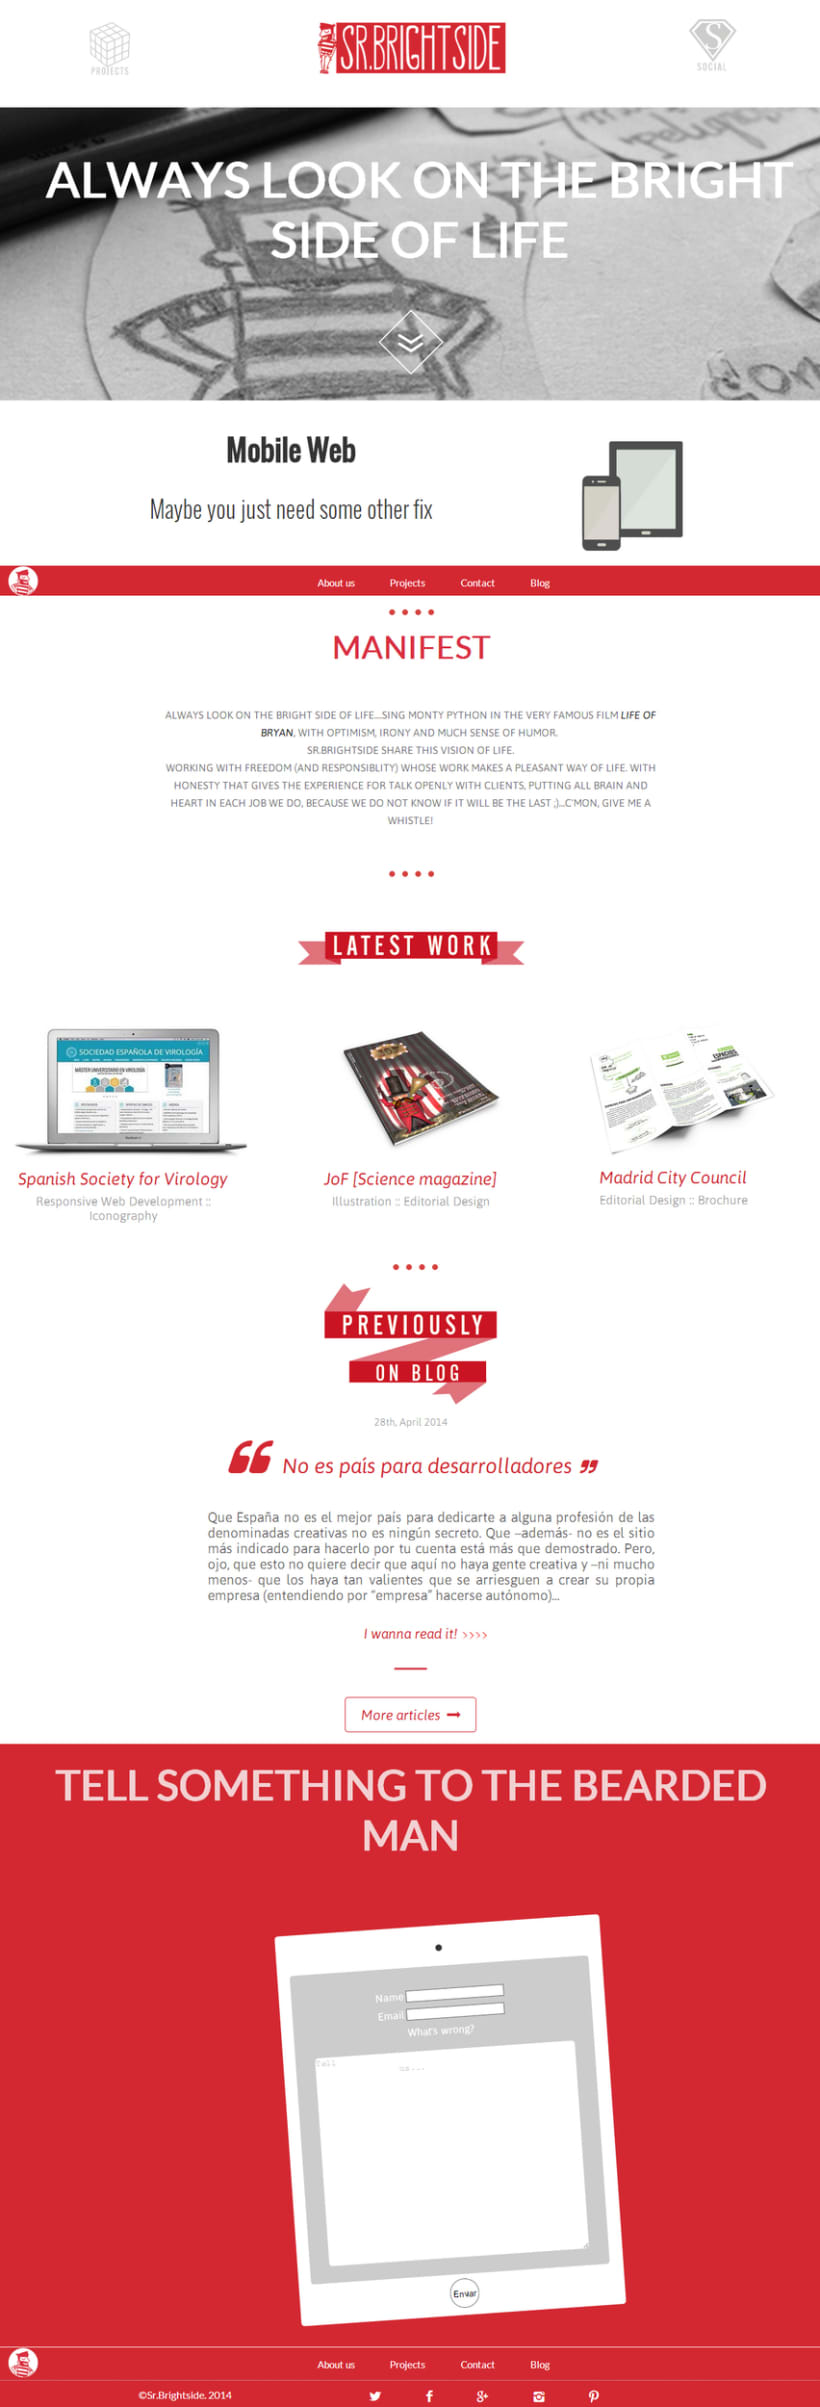 Web responsive de Sr.Brightside 2